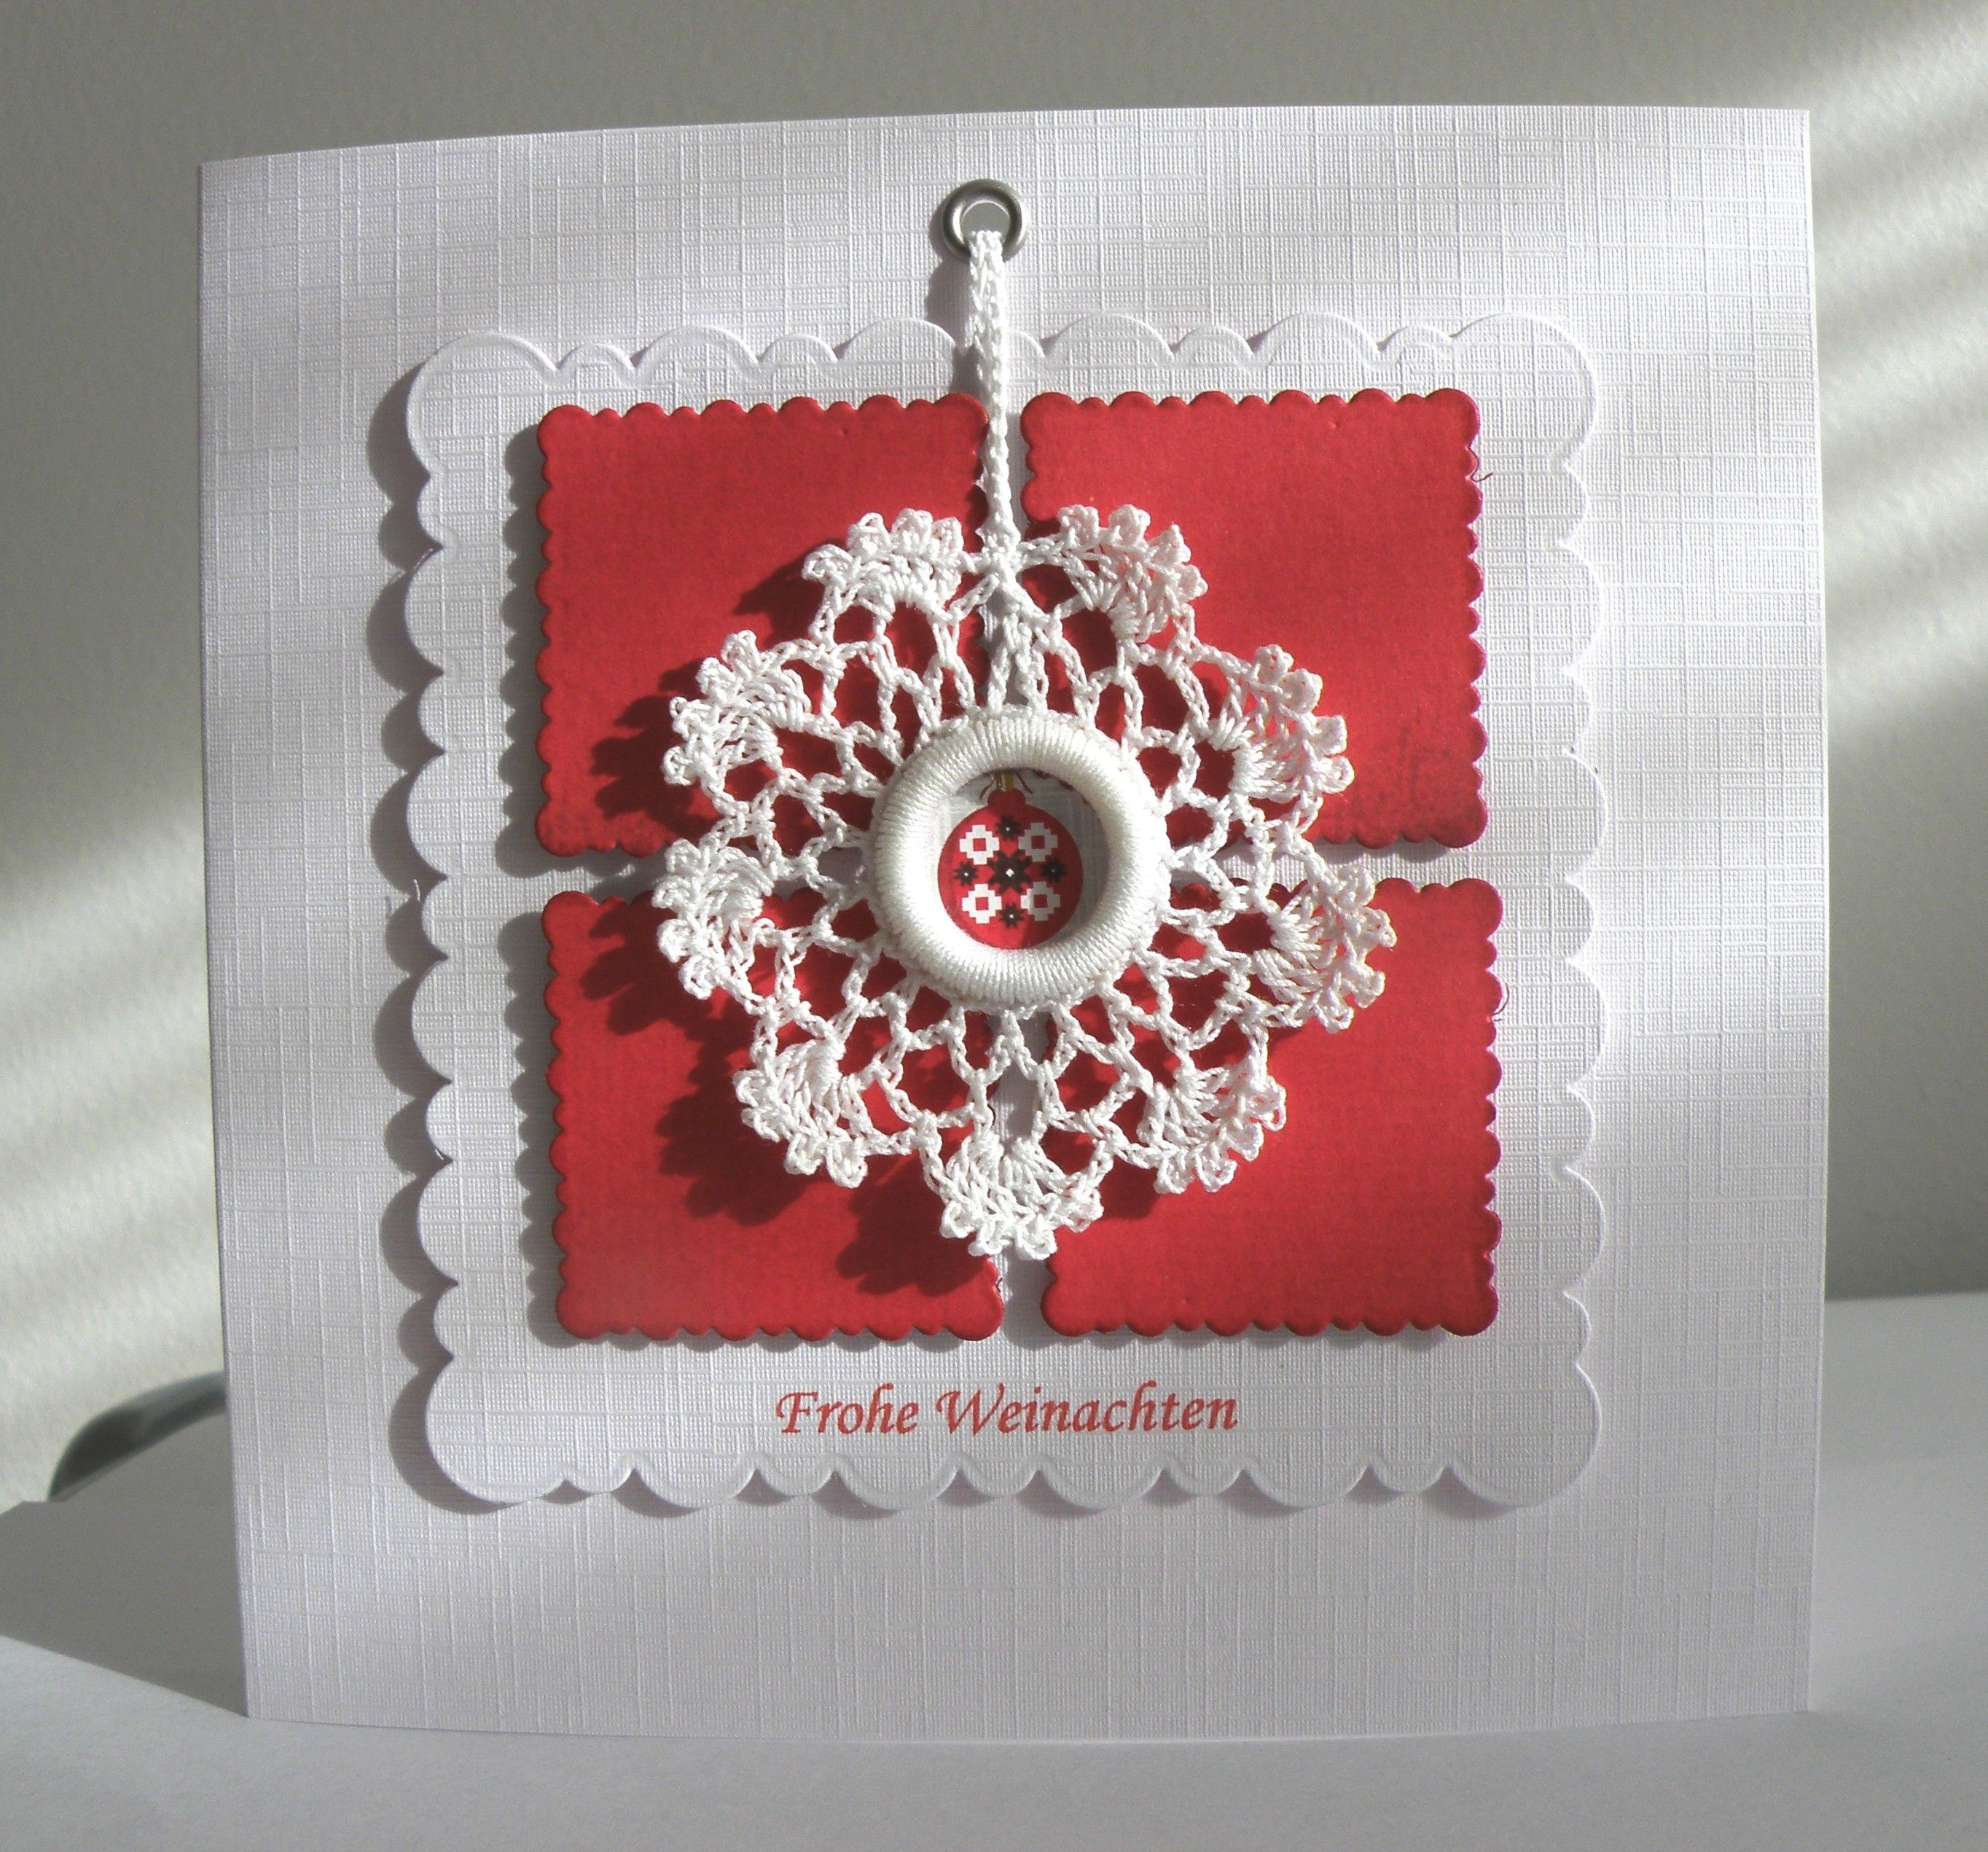 detachable crocheted wreath...a little gift on a Christmas card